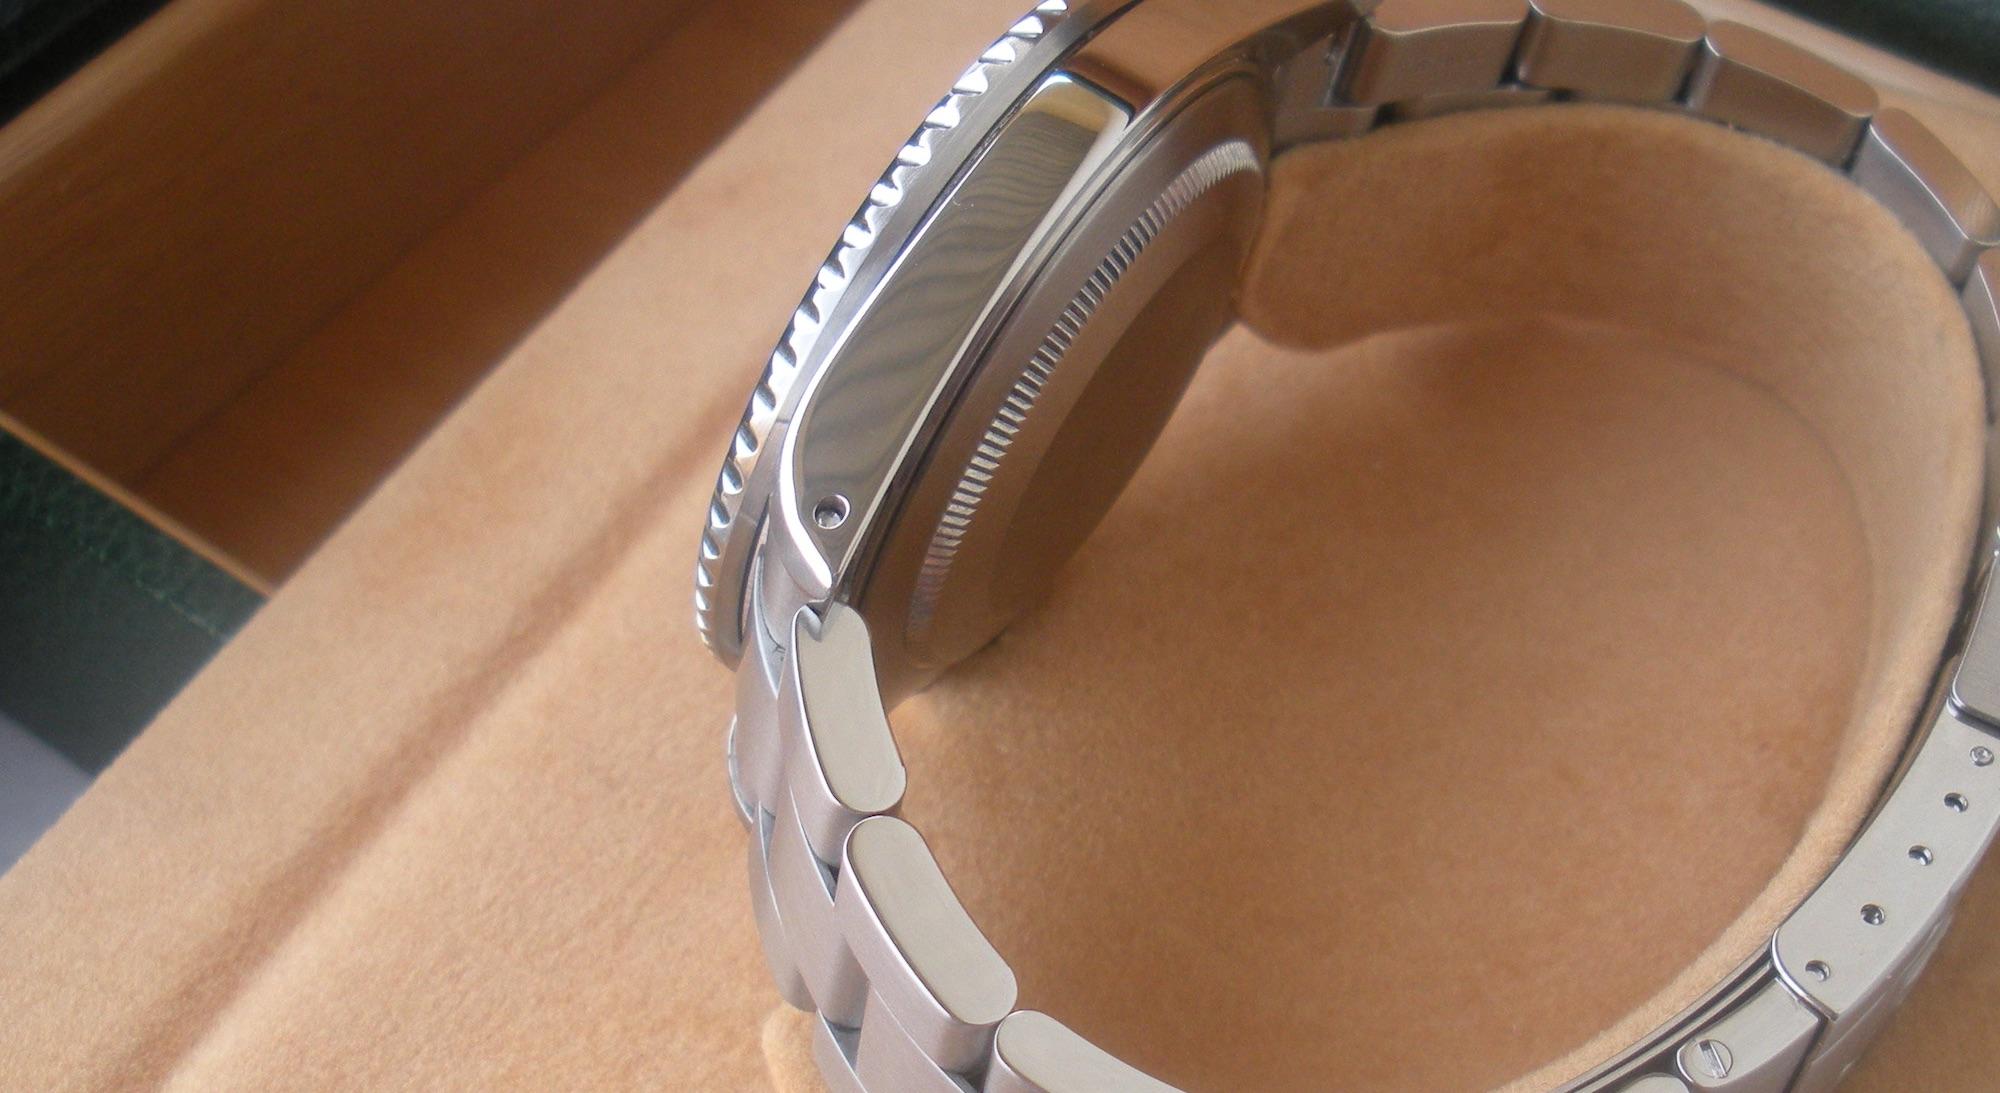 Rolex GMT Master II 16710T carrura con agujeros leve pulido